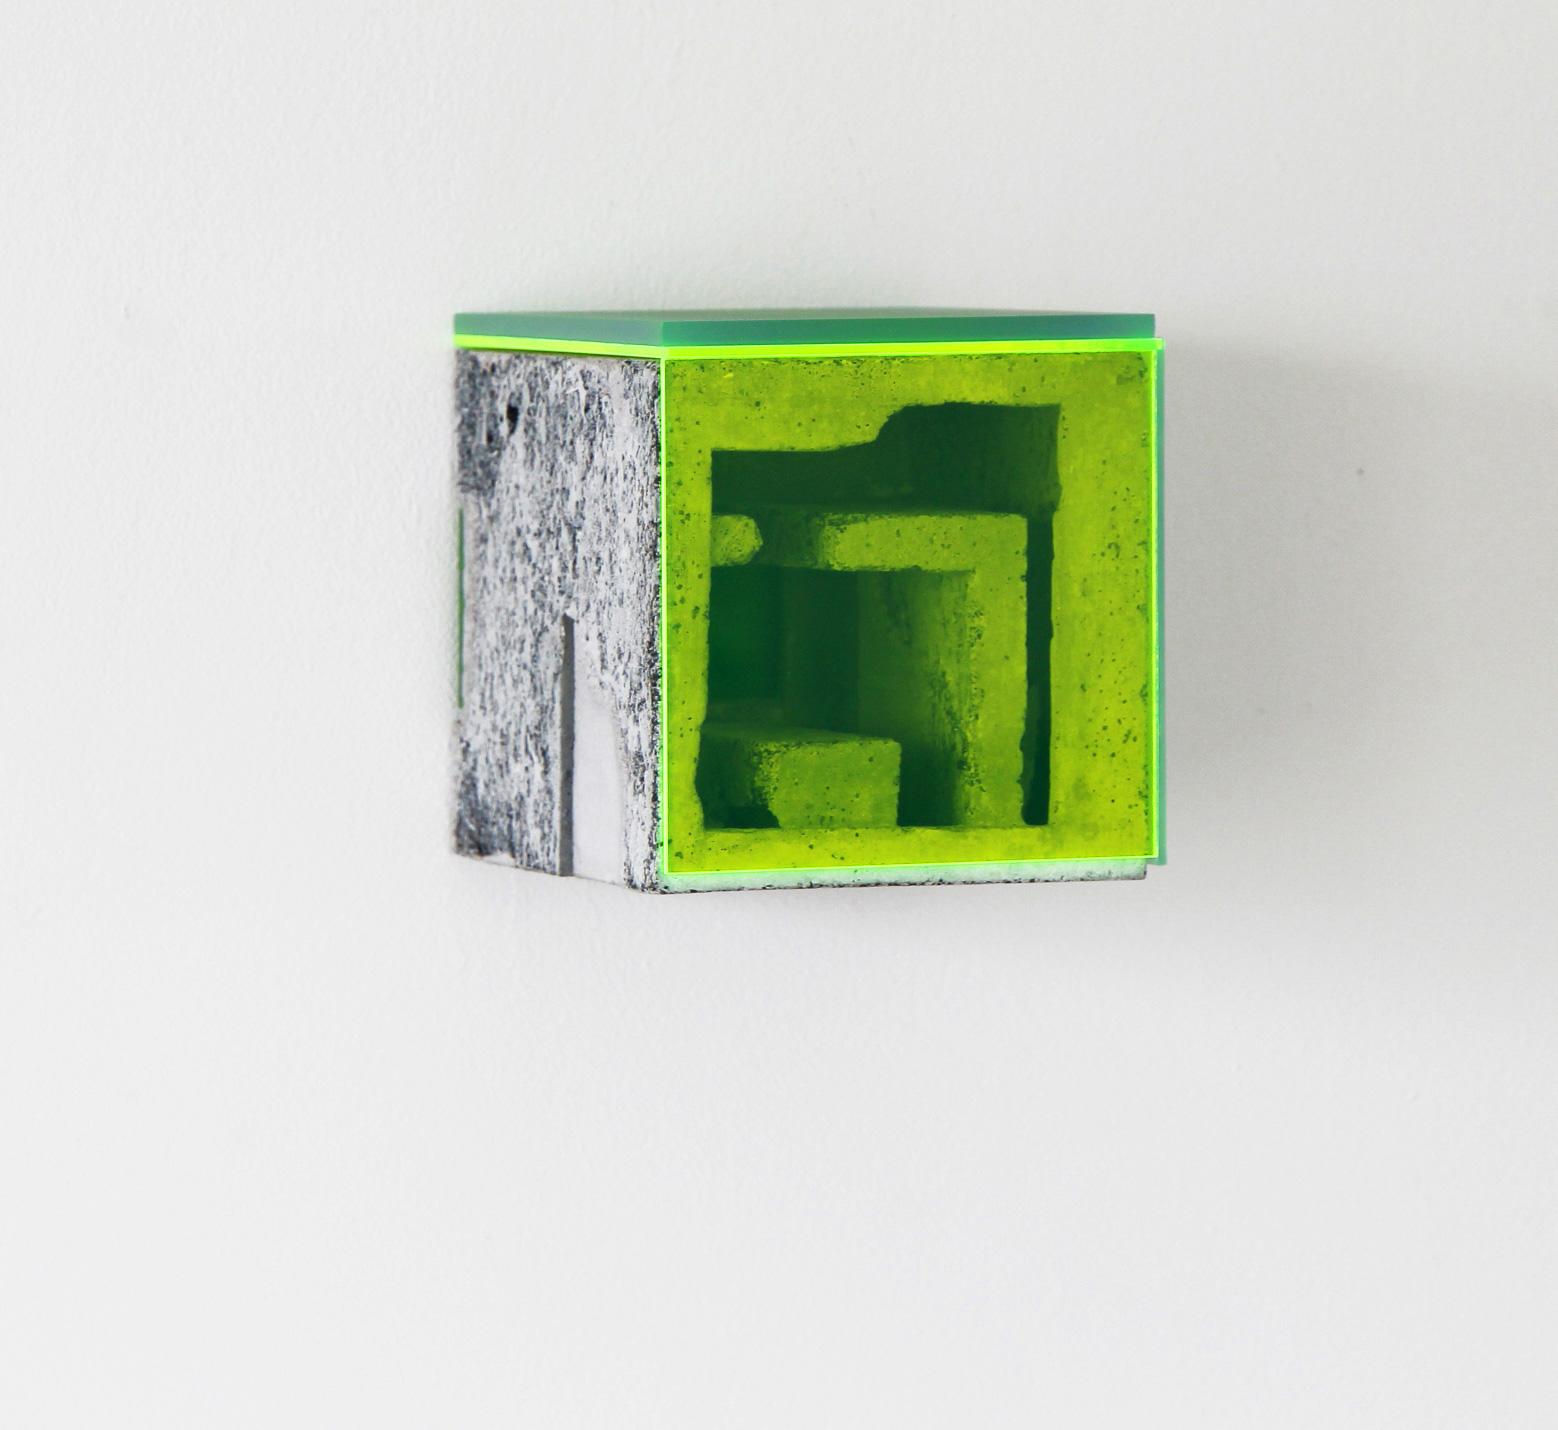 Box X/3 | 2017 | Beton, Acrylglas | 14 x 14 x 14 cm